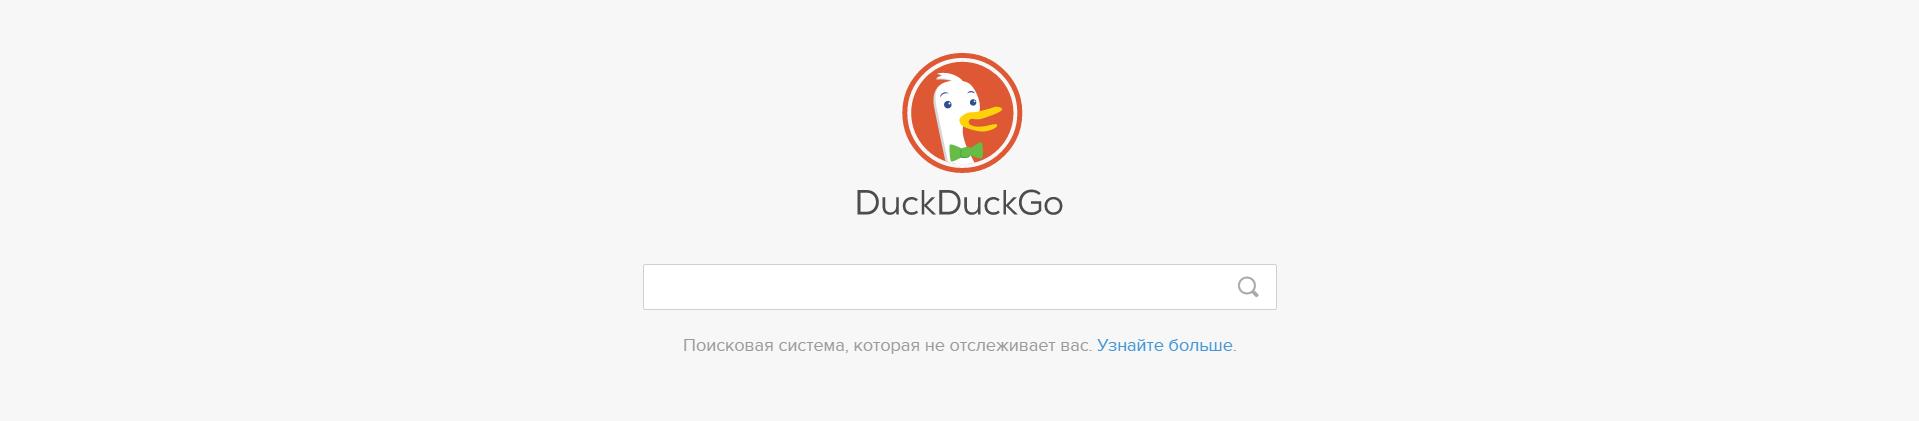 DuckDuckGo пожертвовали 225000$ различным OpenSource проектам - 1